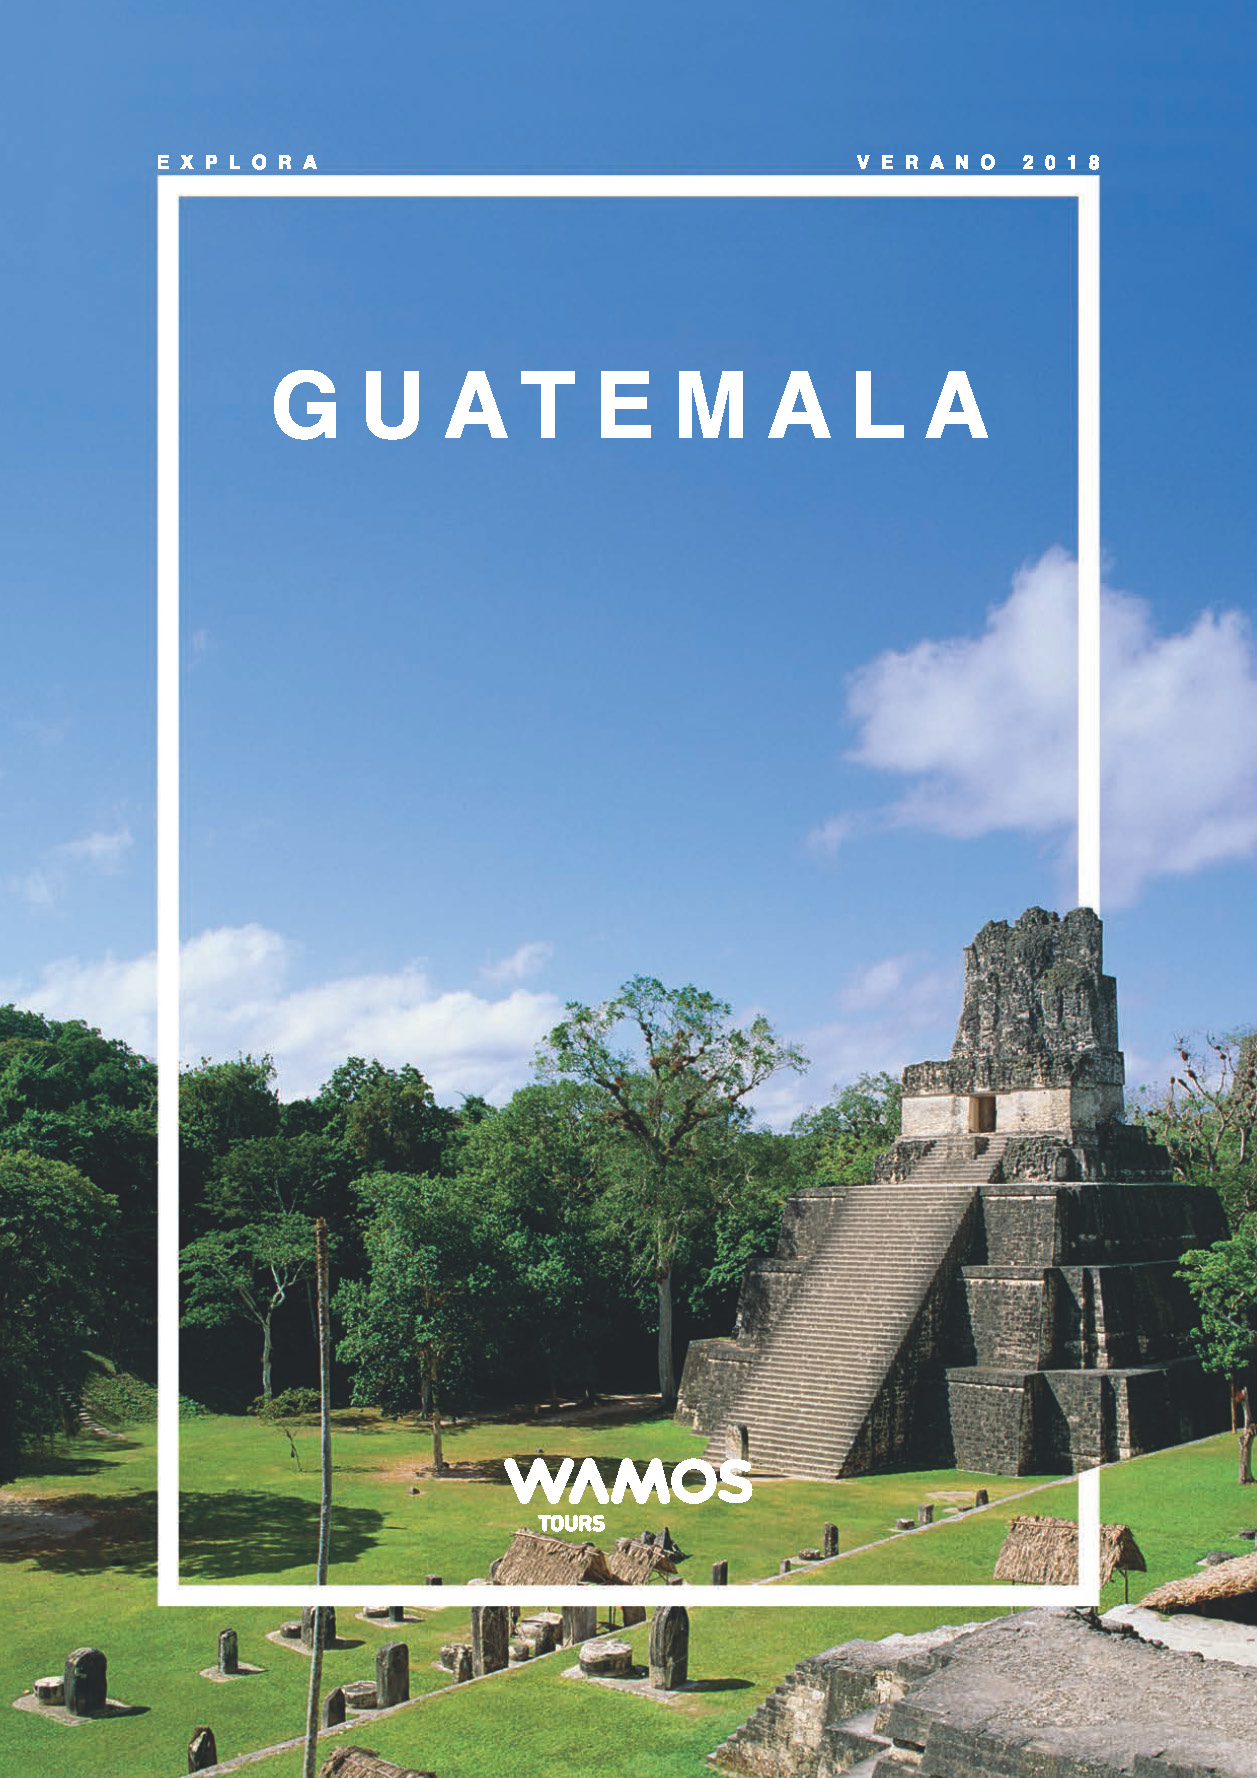 Catalogo Wamos Circuitos Guatemala Verano 2018